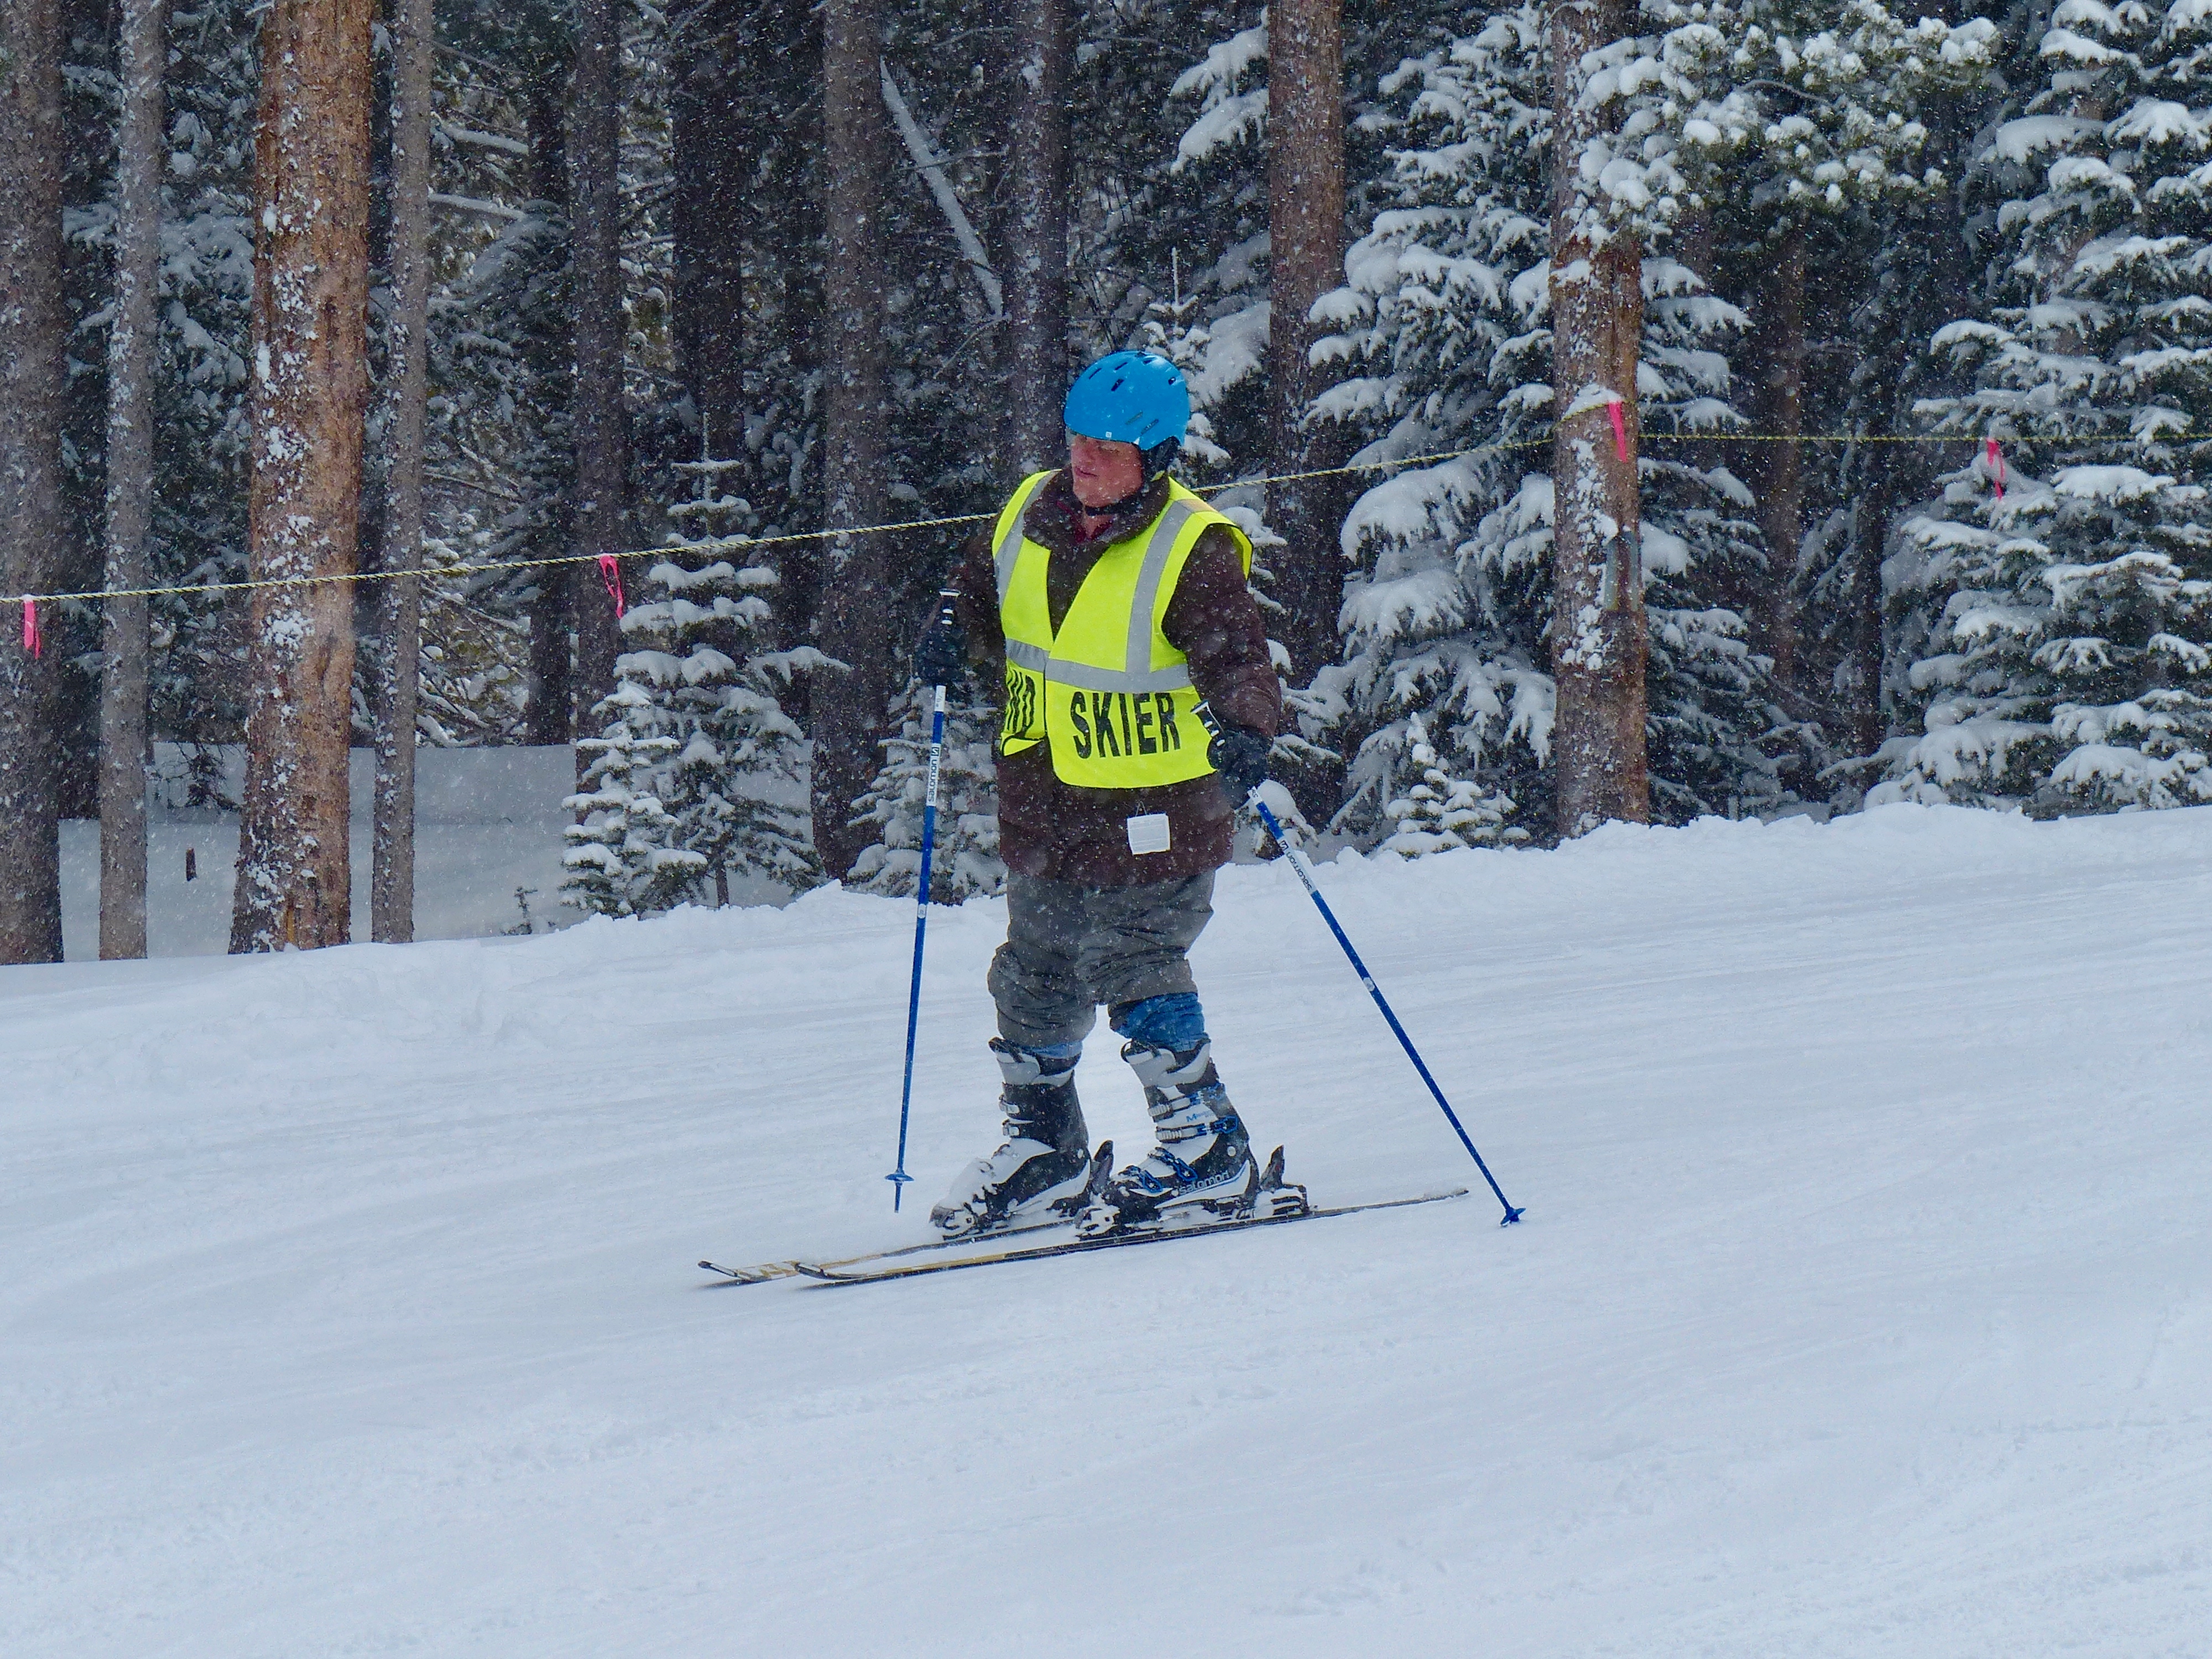 David D. Skiing down the slopes through falling snow